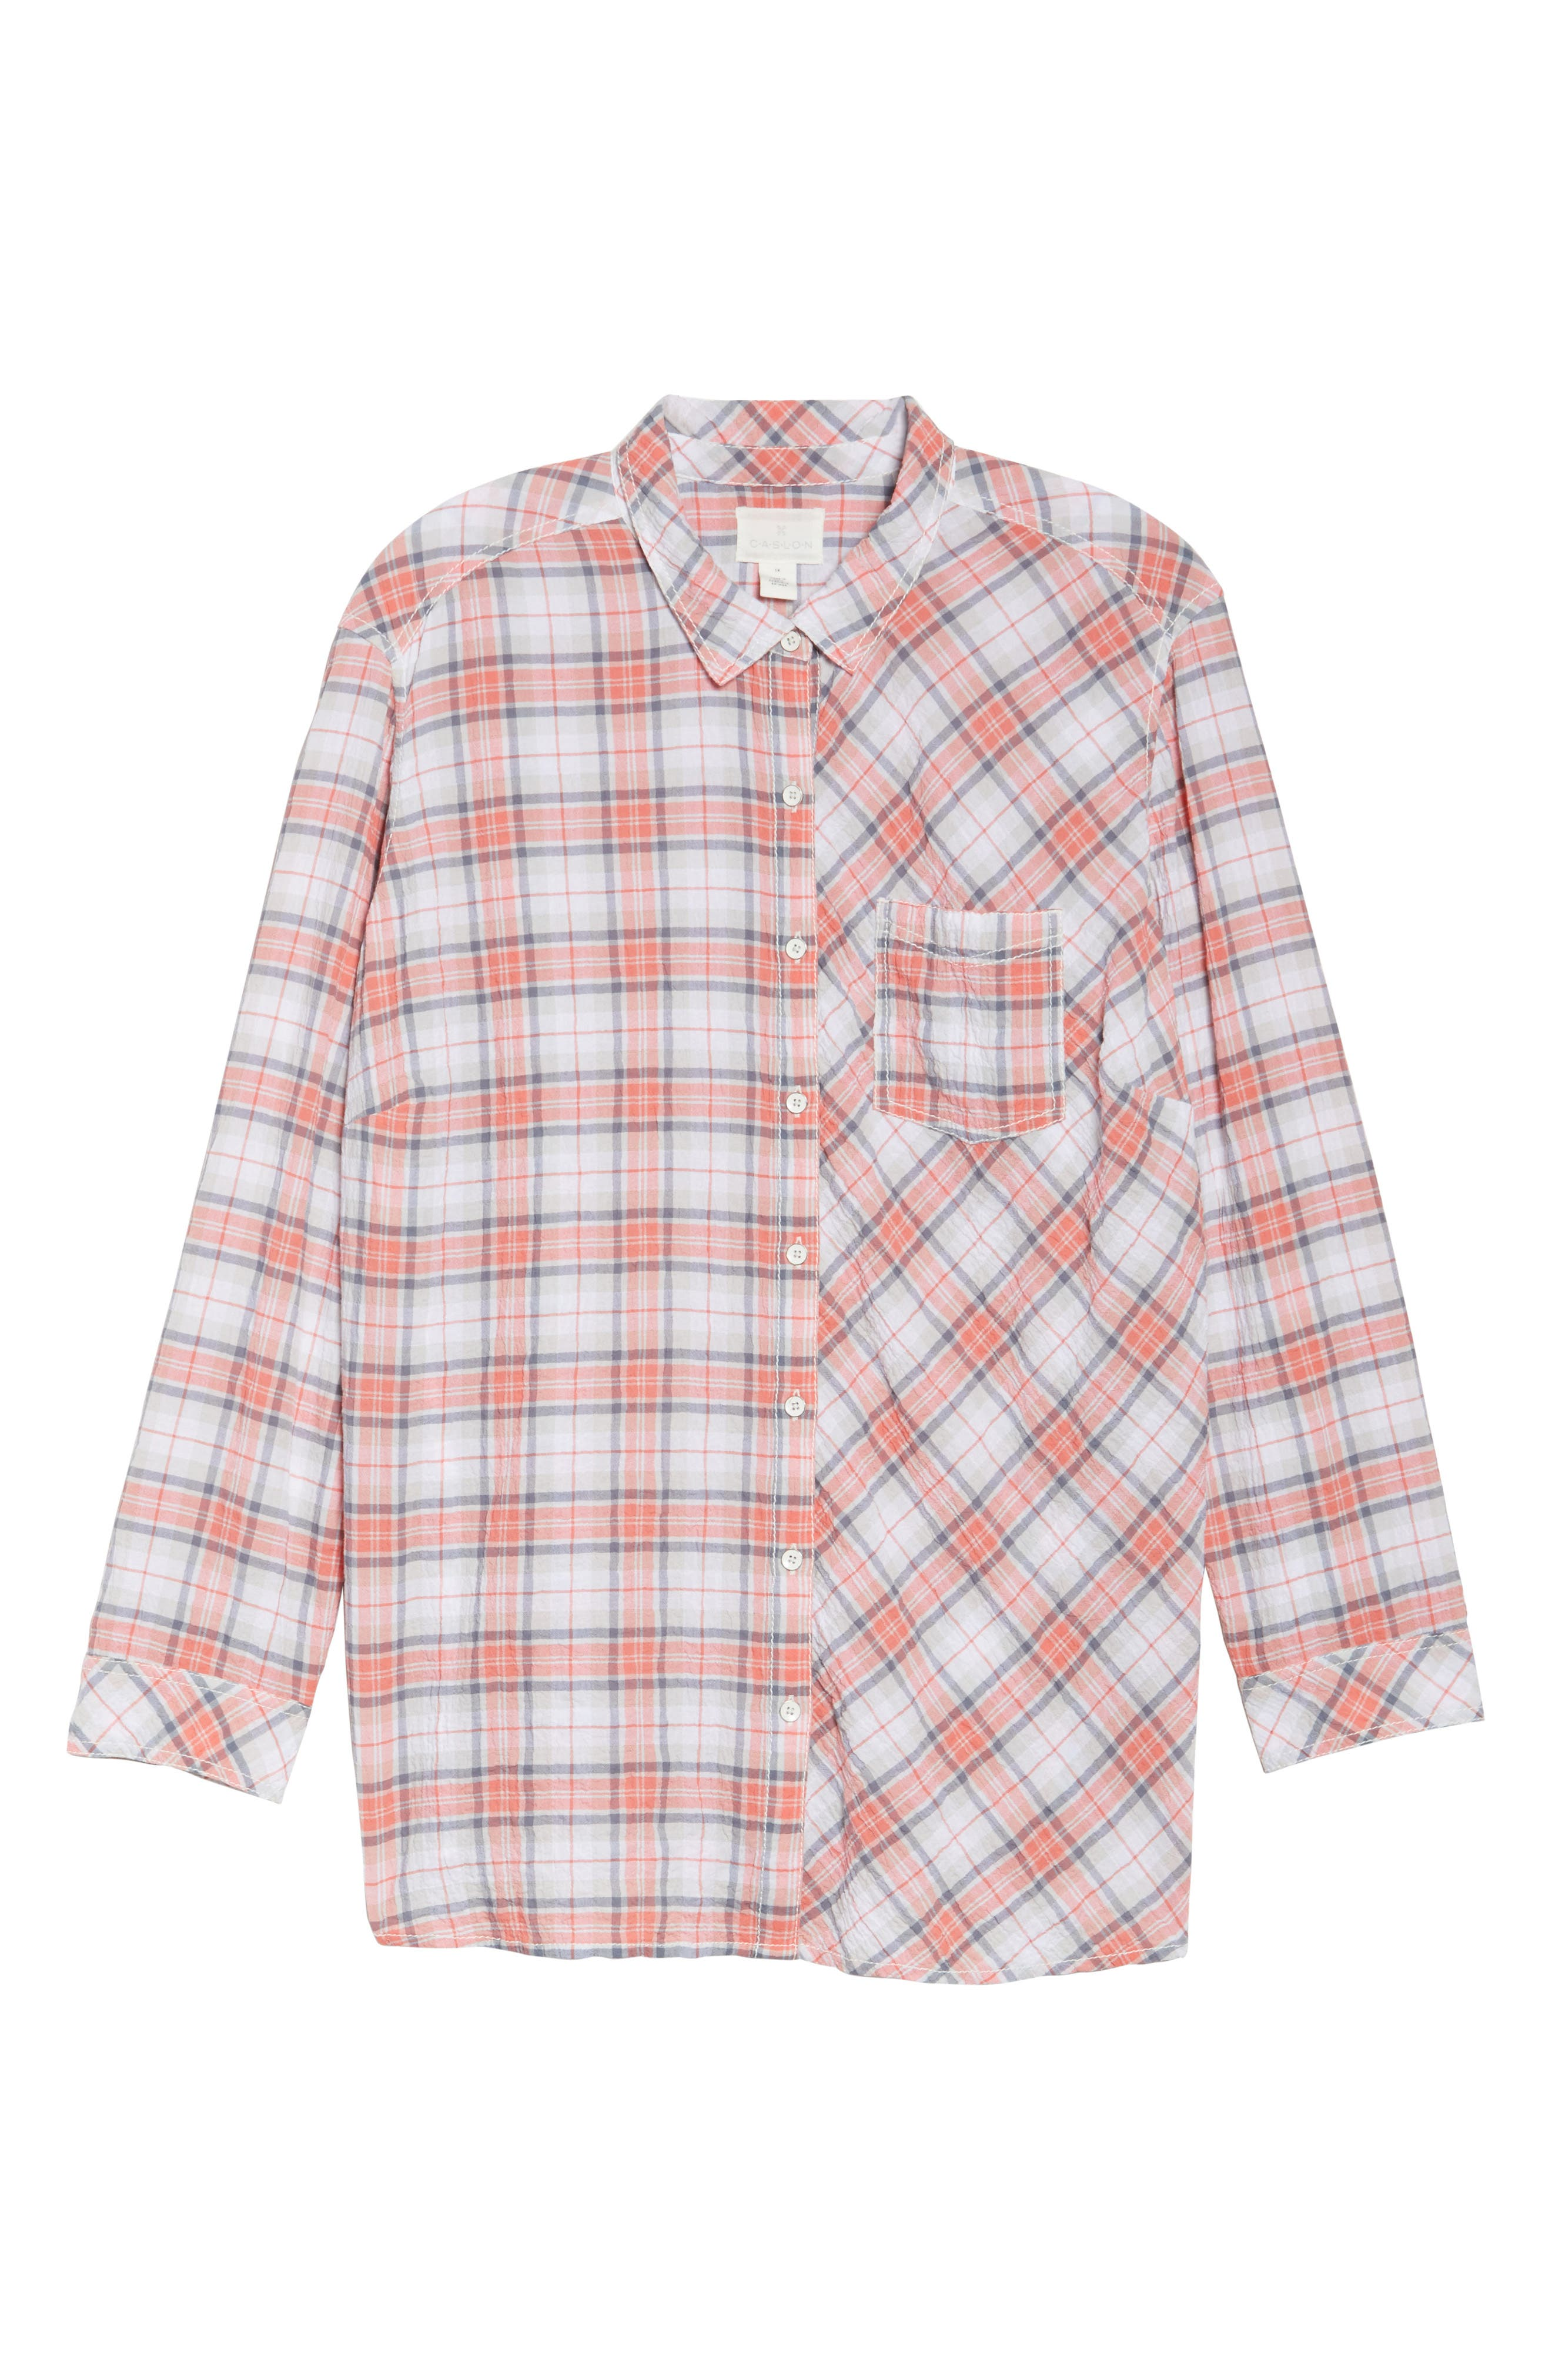 Seersucker Shirt,                             Alternate thumbnail 6, color,                             White- Coral Plaid